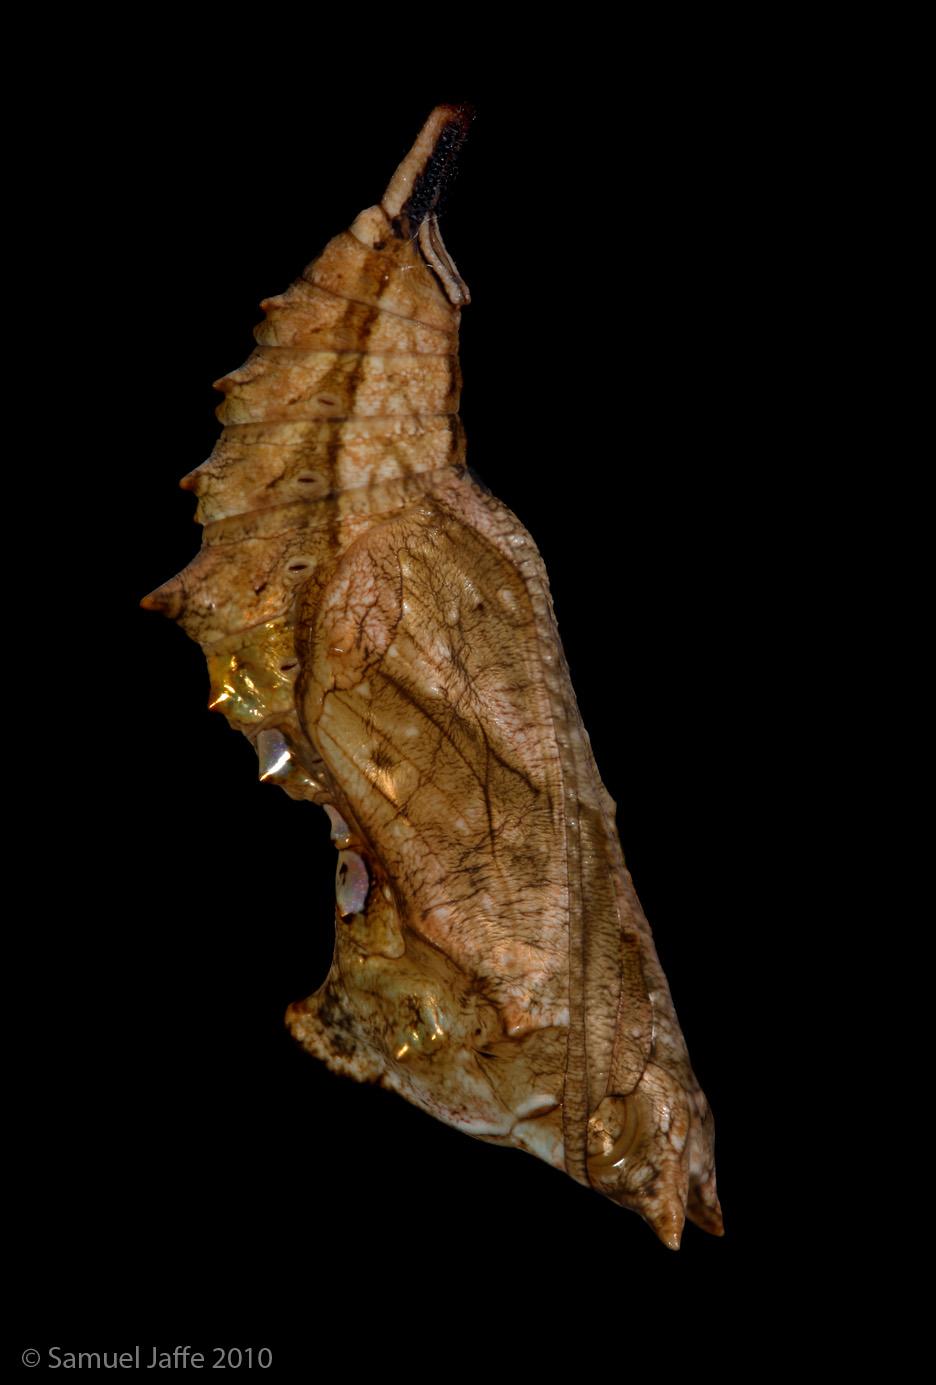 Polygonia comma - Comma Chrysalis